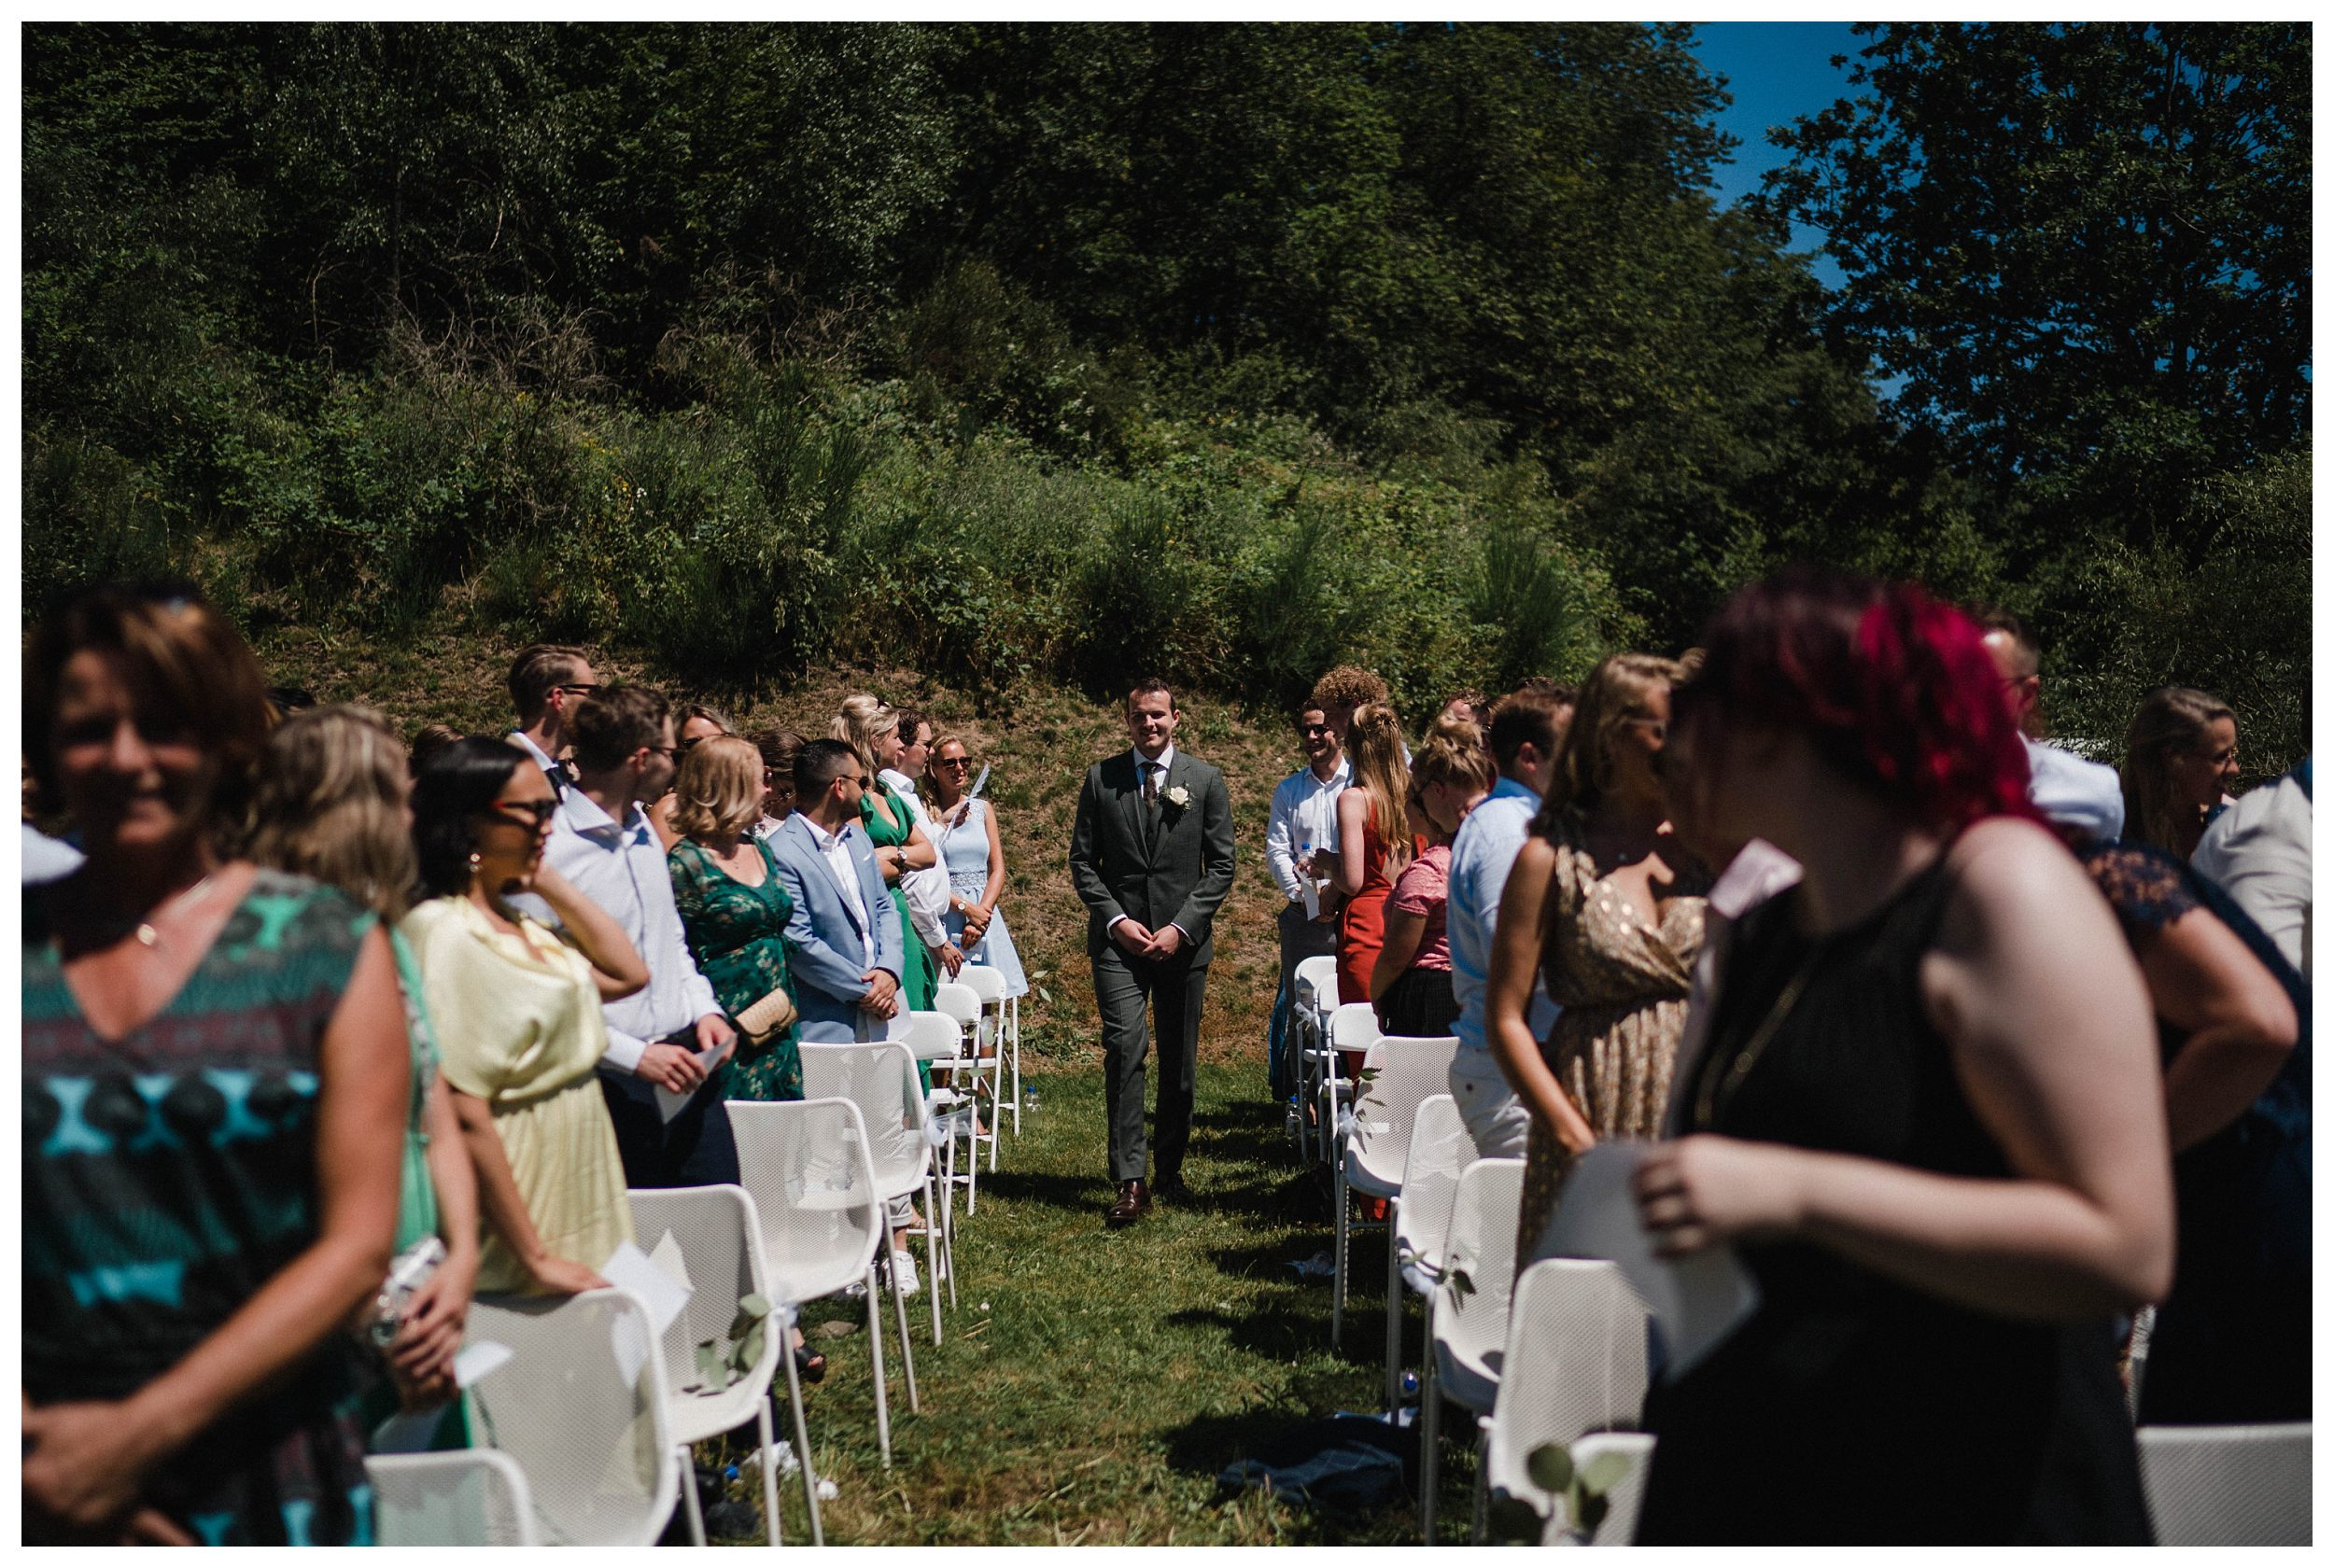 huwelijksfotograaf bruidsfotograaf destinationwedding huwelijksfotografie in ardennen nederland (62).jpg